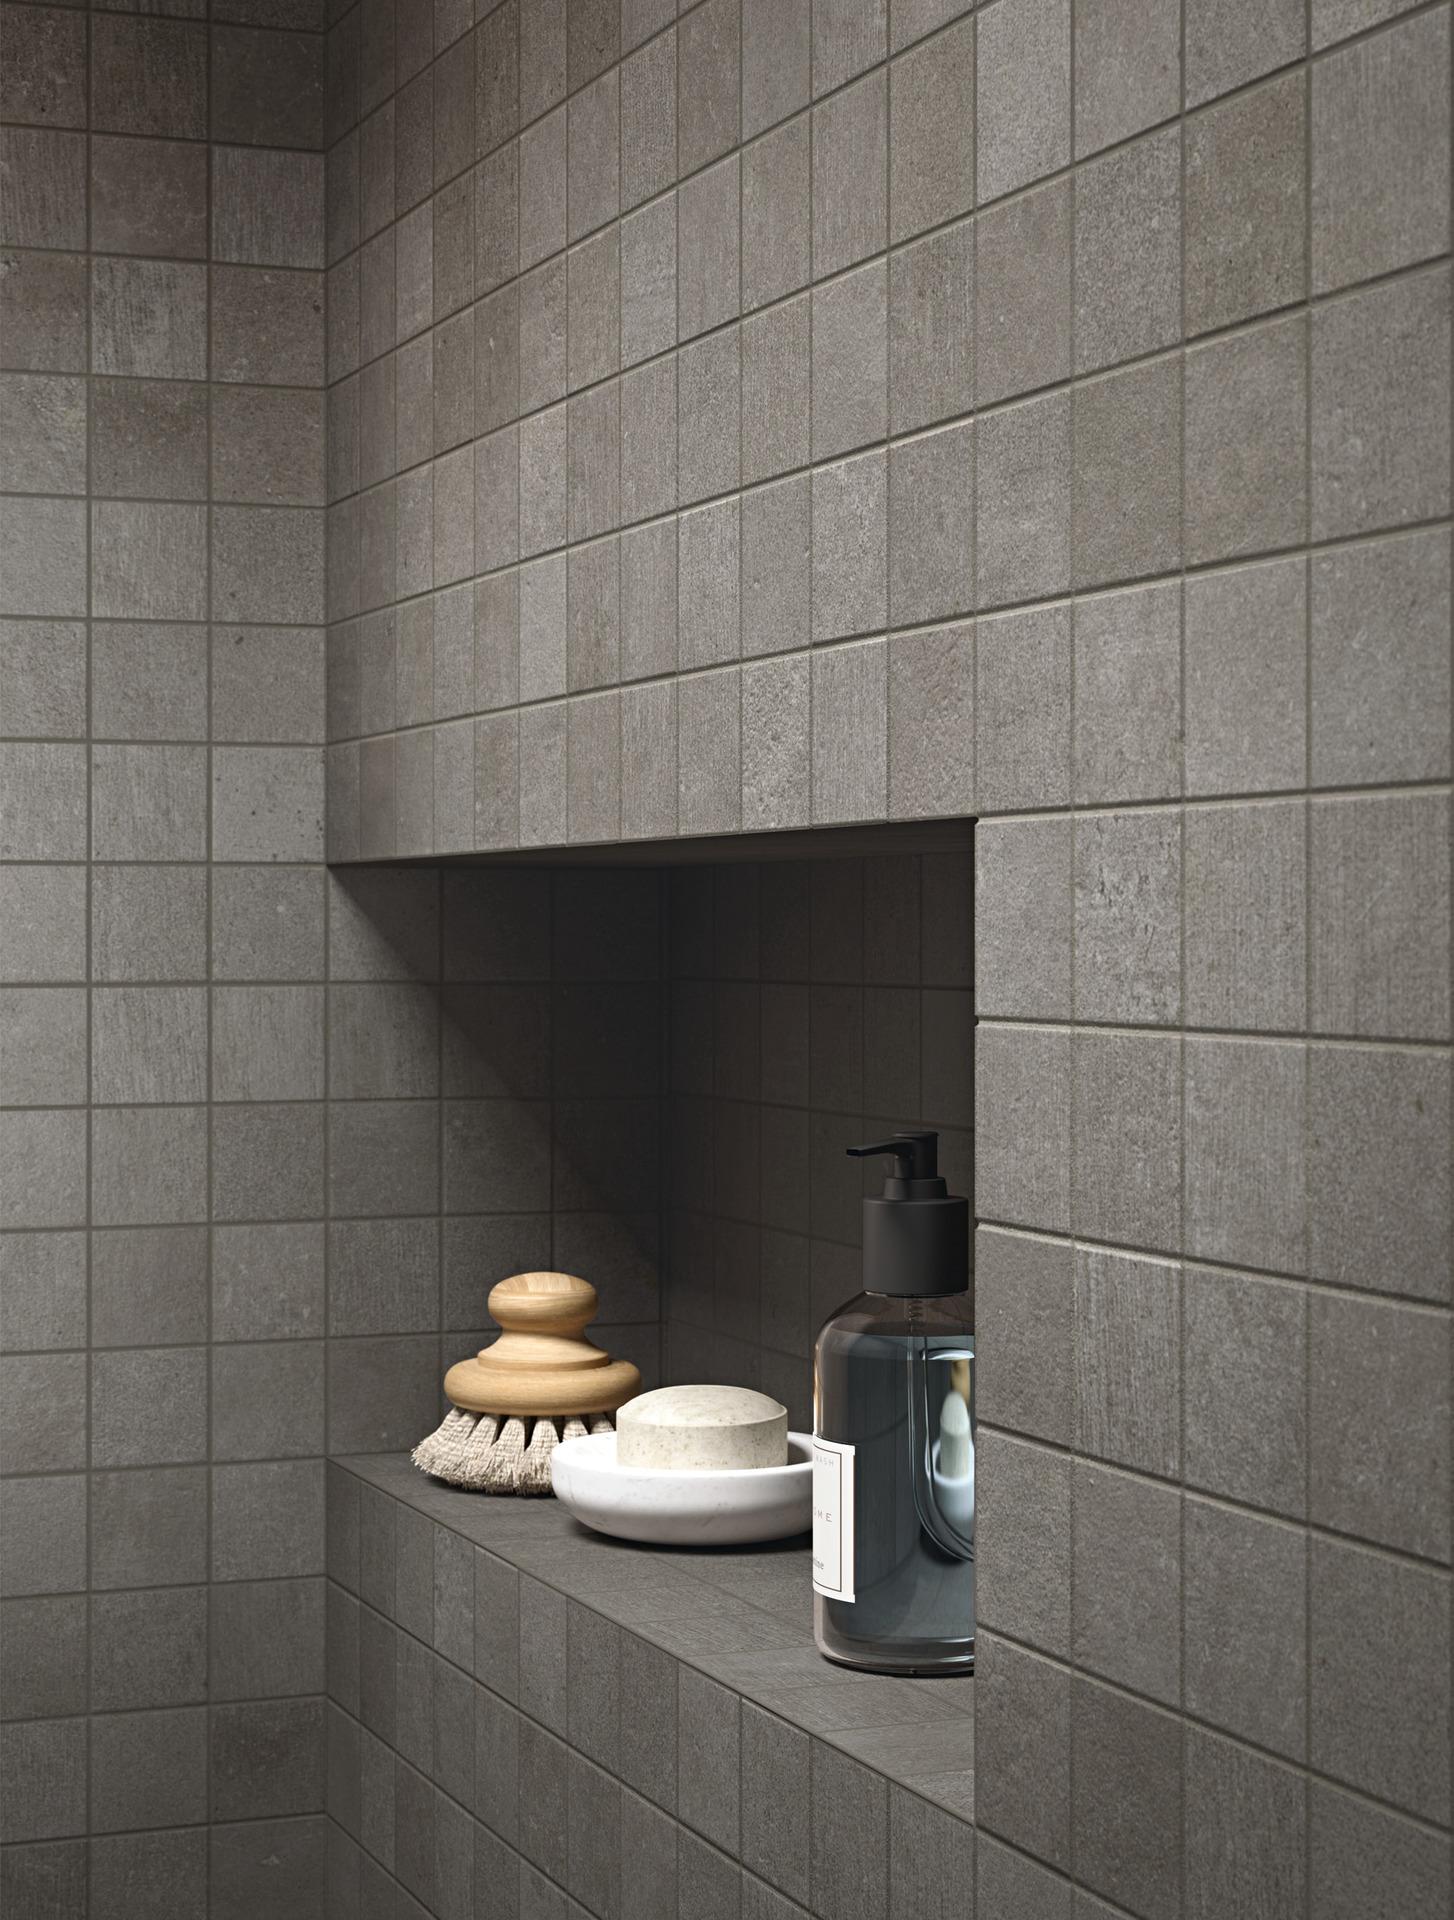 Studio collection modern concrete surfaces ragno studio ceramic tiles ragno7215 dailygadgetfo Image collections